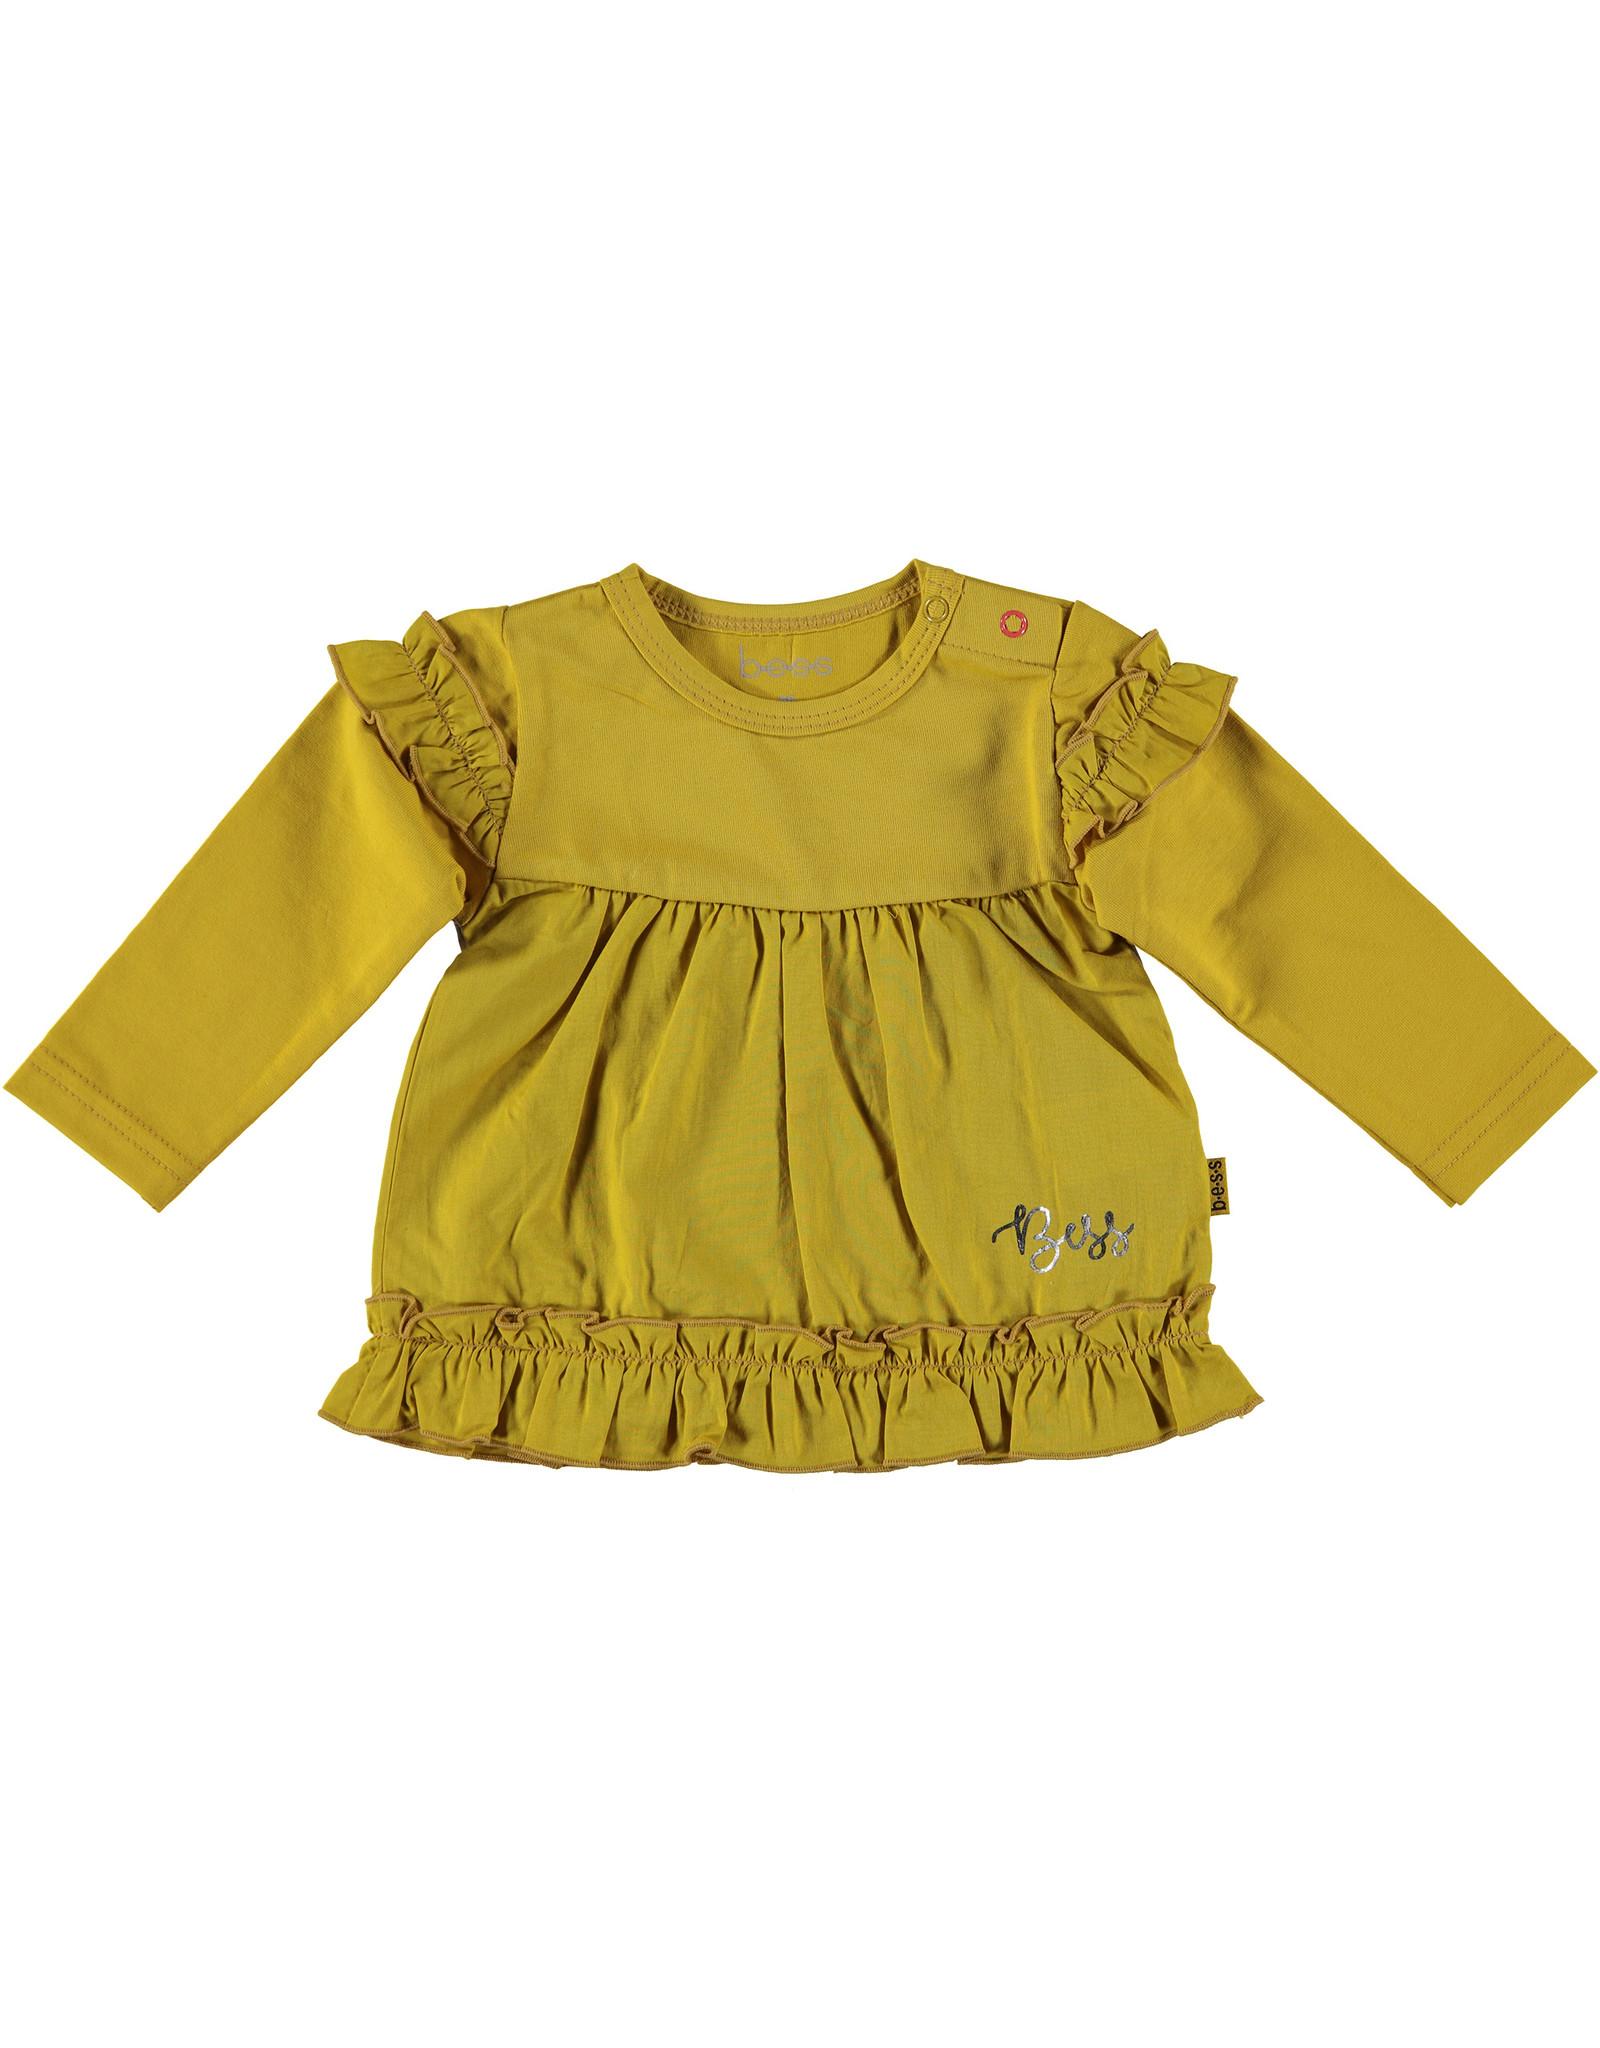 B.E.S.S. Shirt l.sl. Ruffles, Ocre